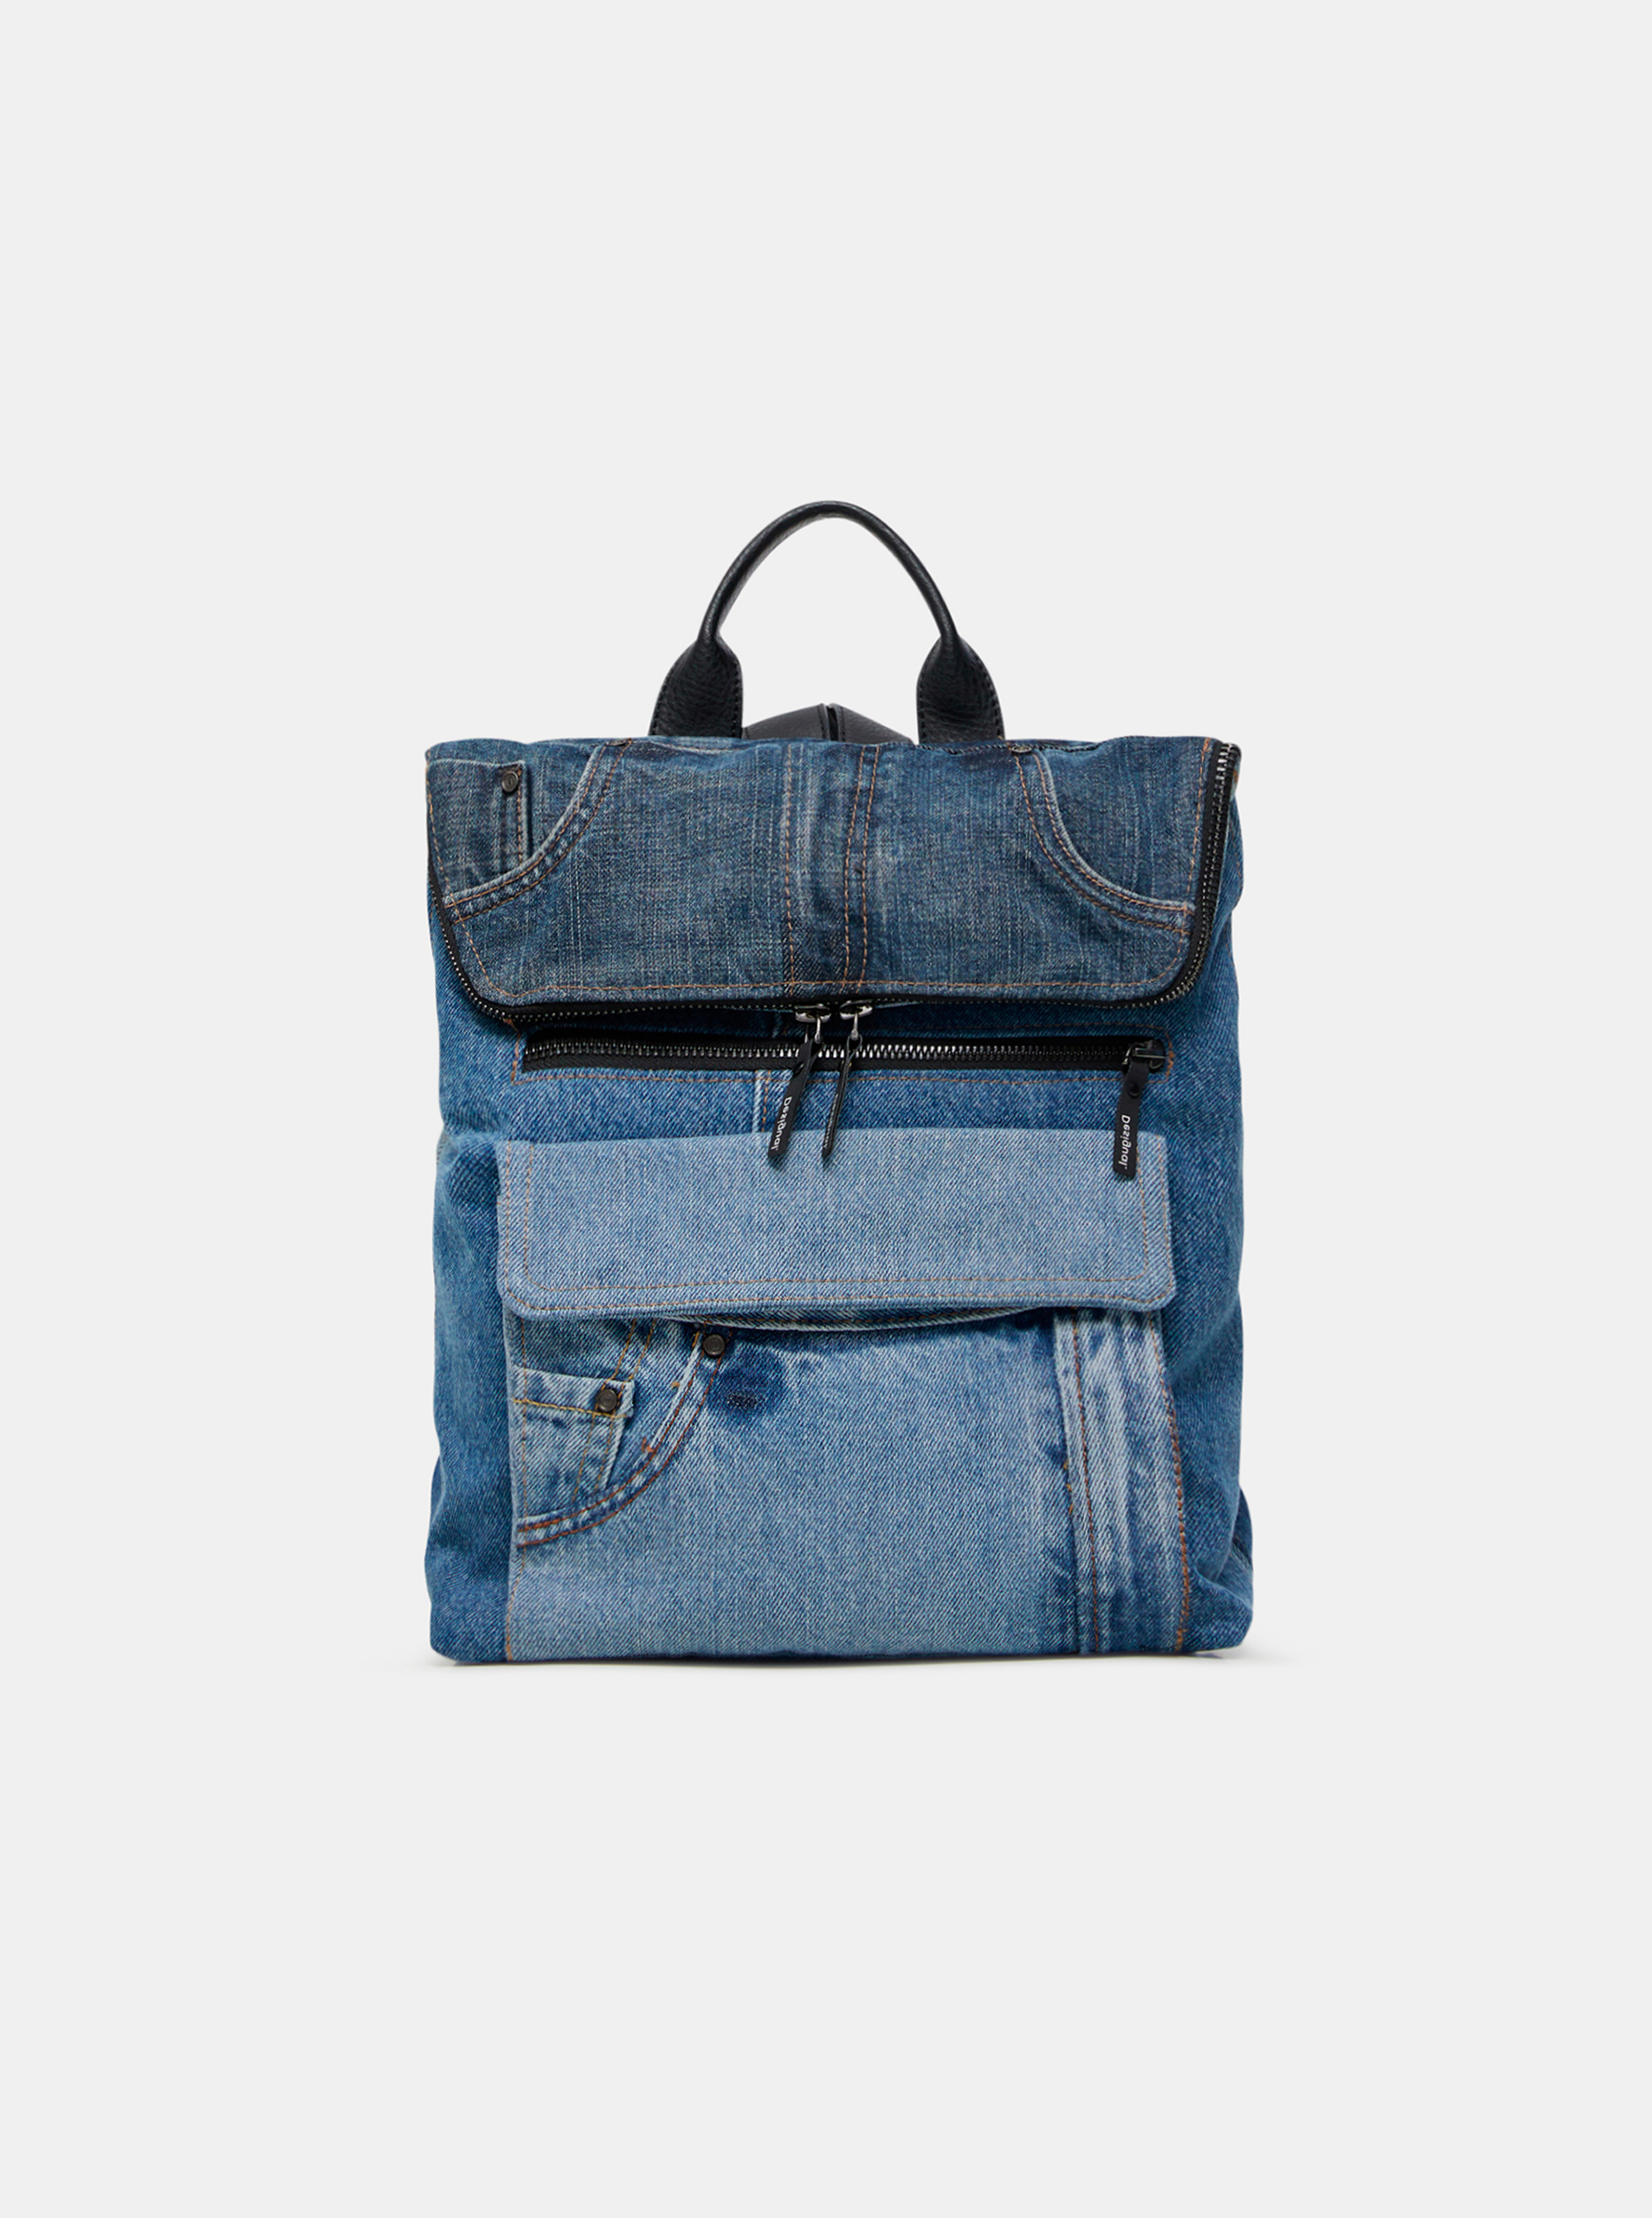 Desigual Women's backpack blue  Denim